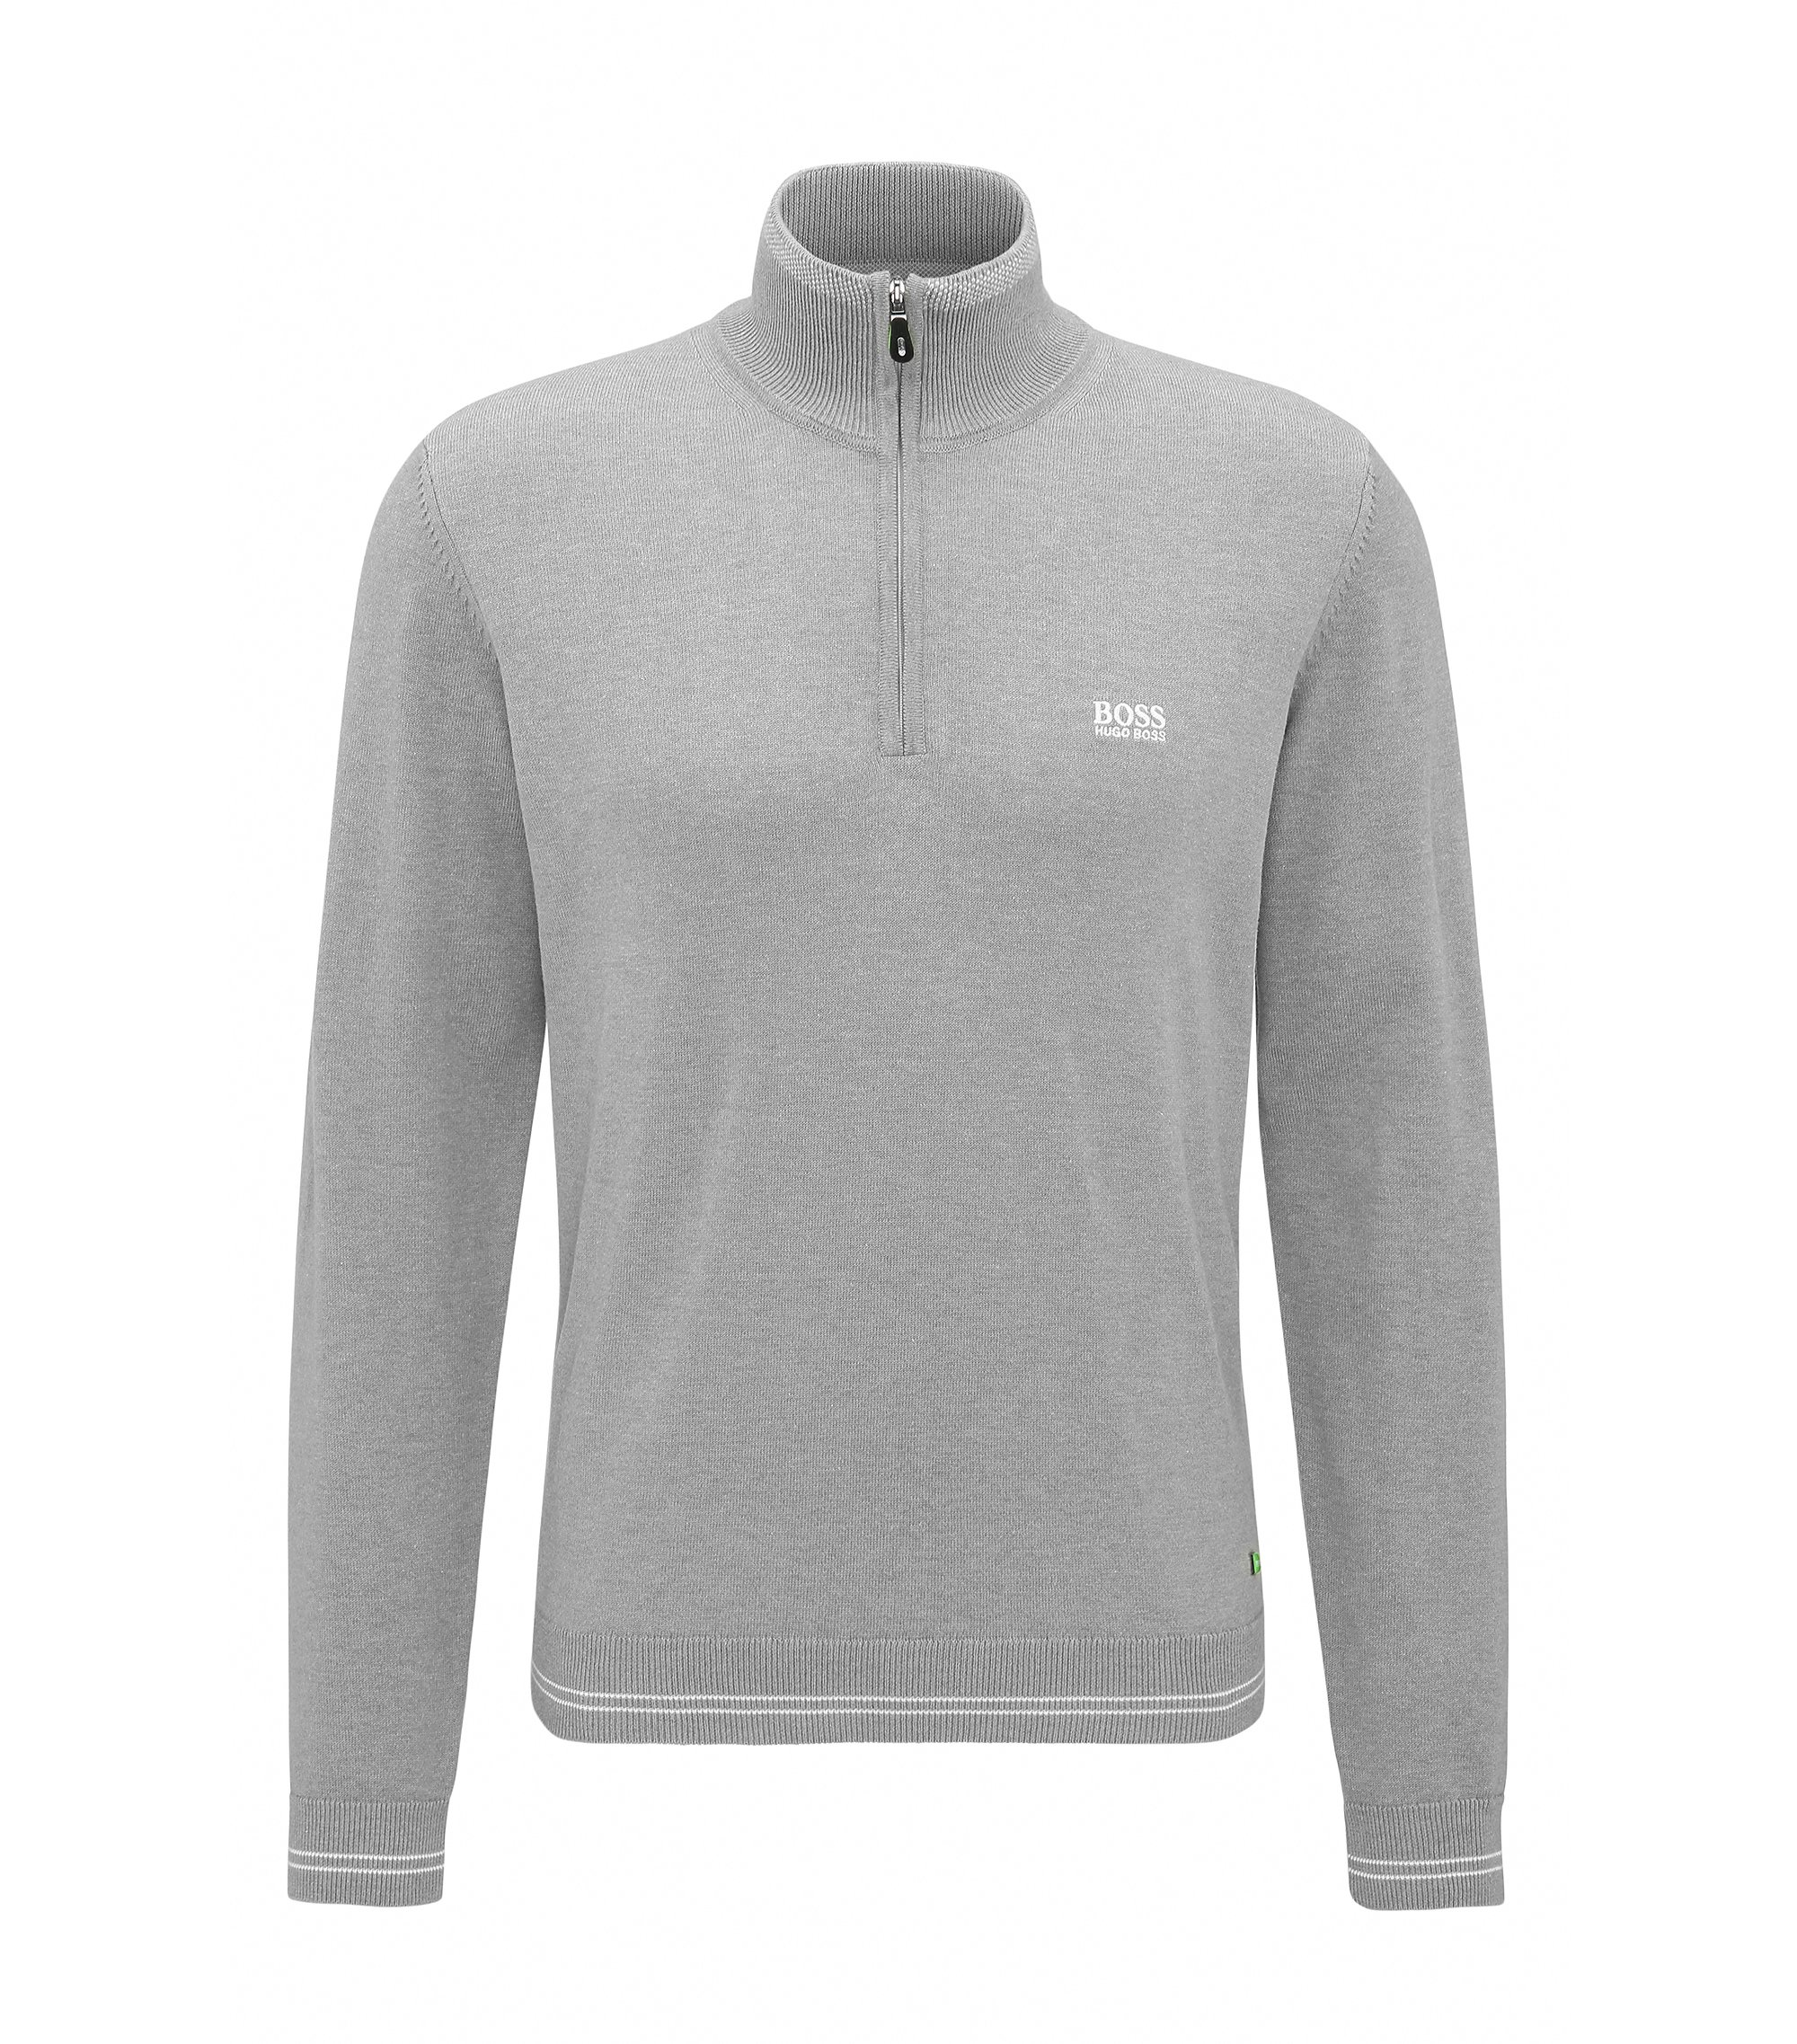 Cotton Blend Half-Zip Sweater | Zime W17, Light Grey